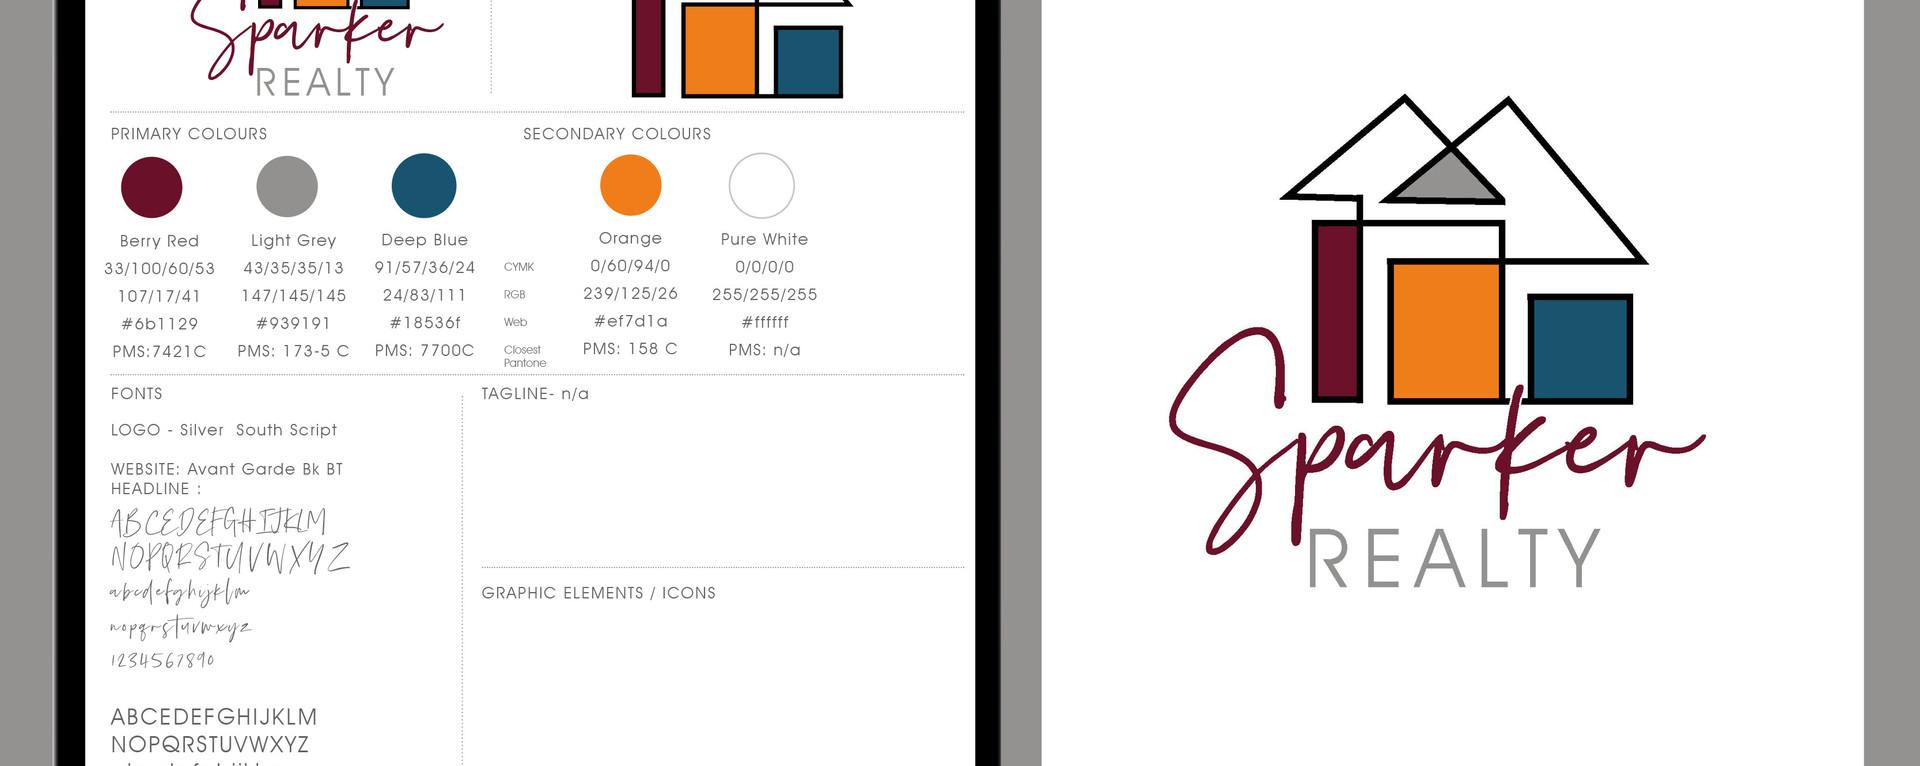 NEW BRAND / LOGO  DESIGN | SPARKER REALTY